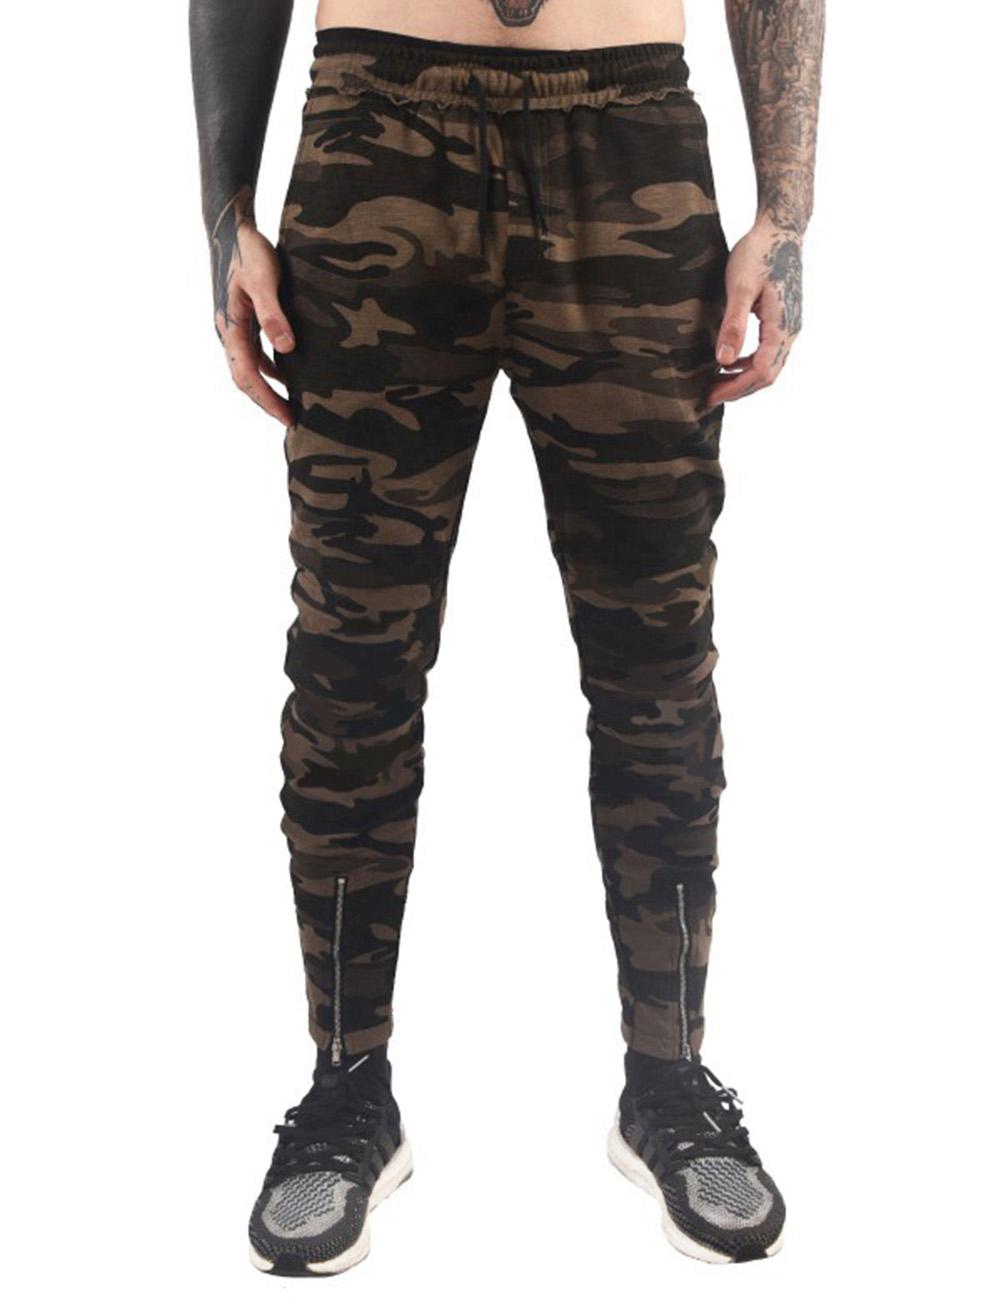 Stylish Men Camouflage Sports Trousers with Zipper Leg Opening Elastic Band Waist Long Pants Gift Green Camo_2XL